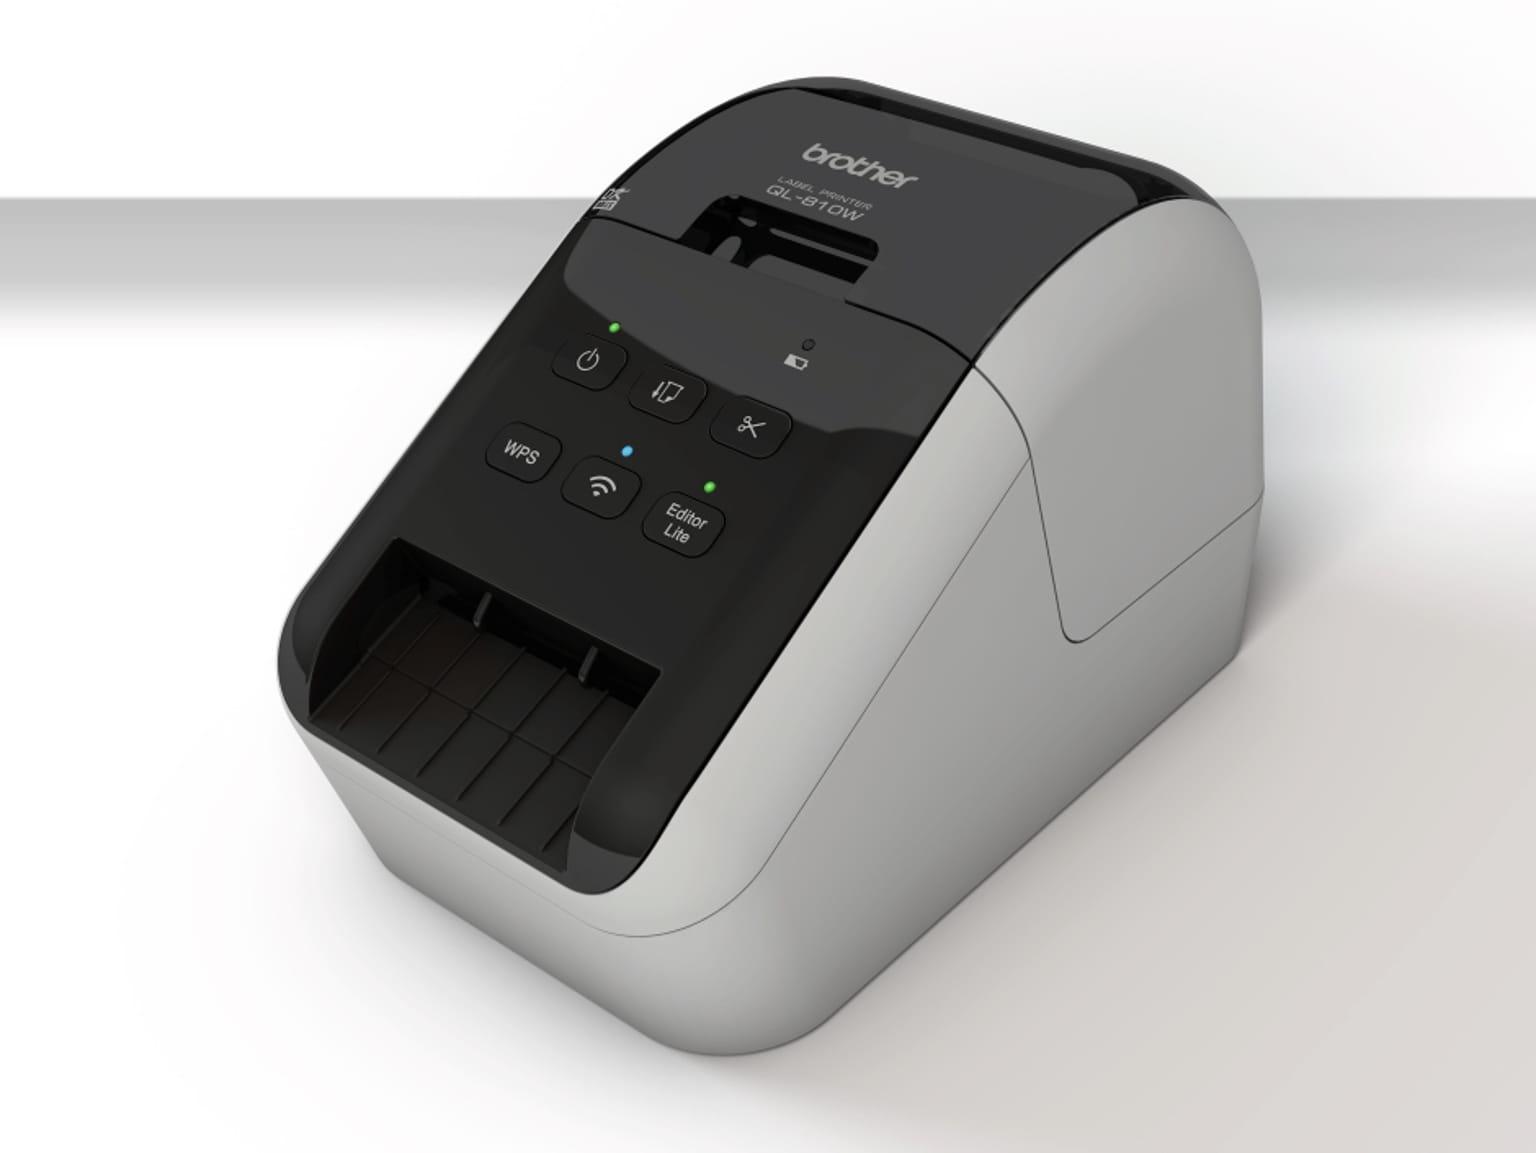 Impresora de etiquetas QL-810W